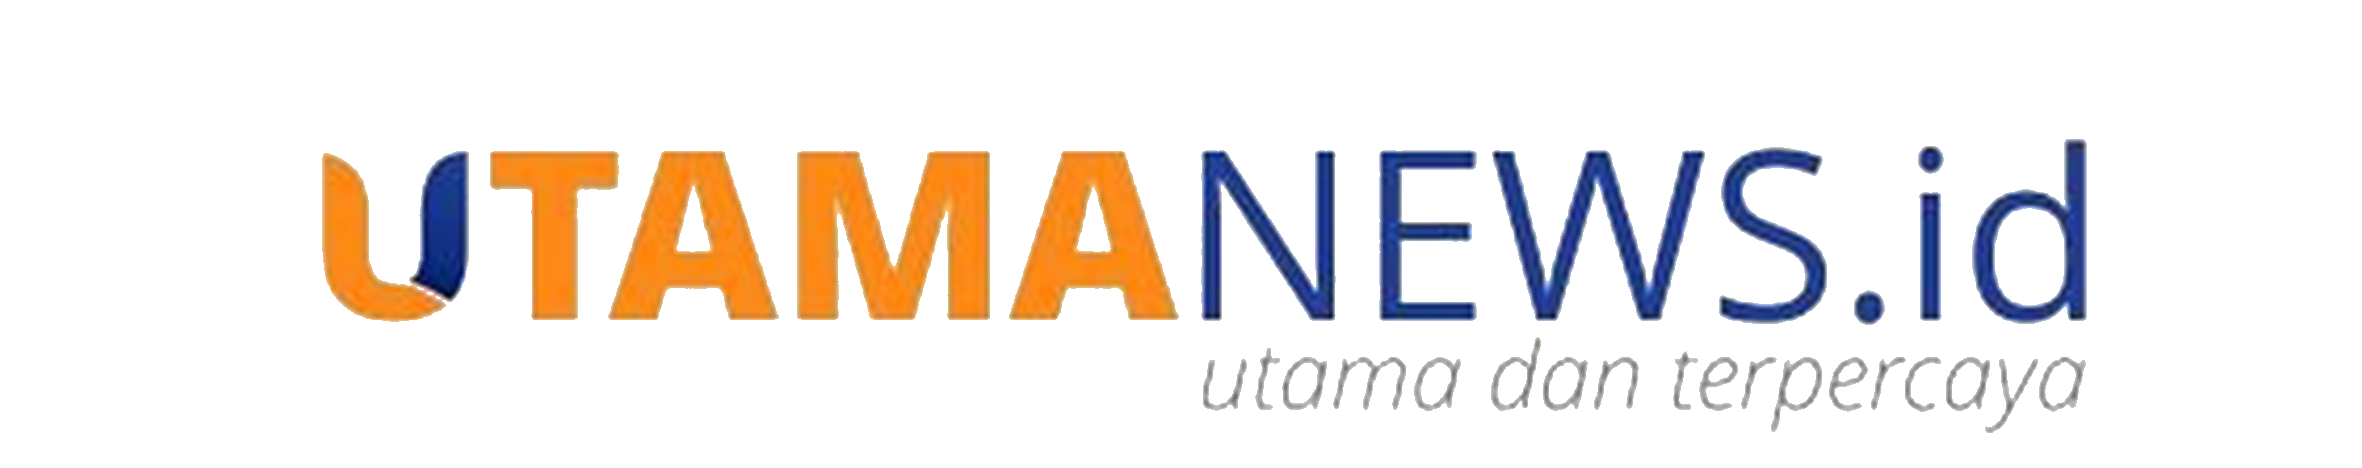 Utamanews.id